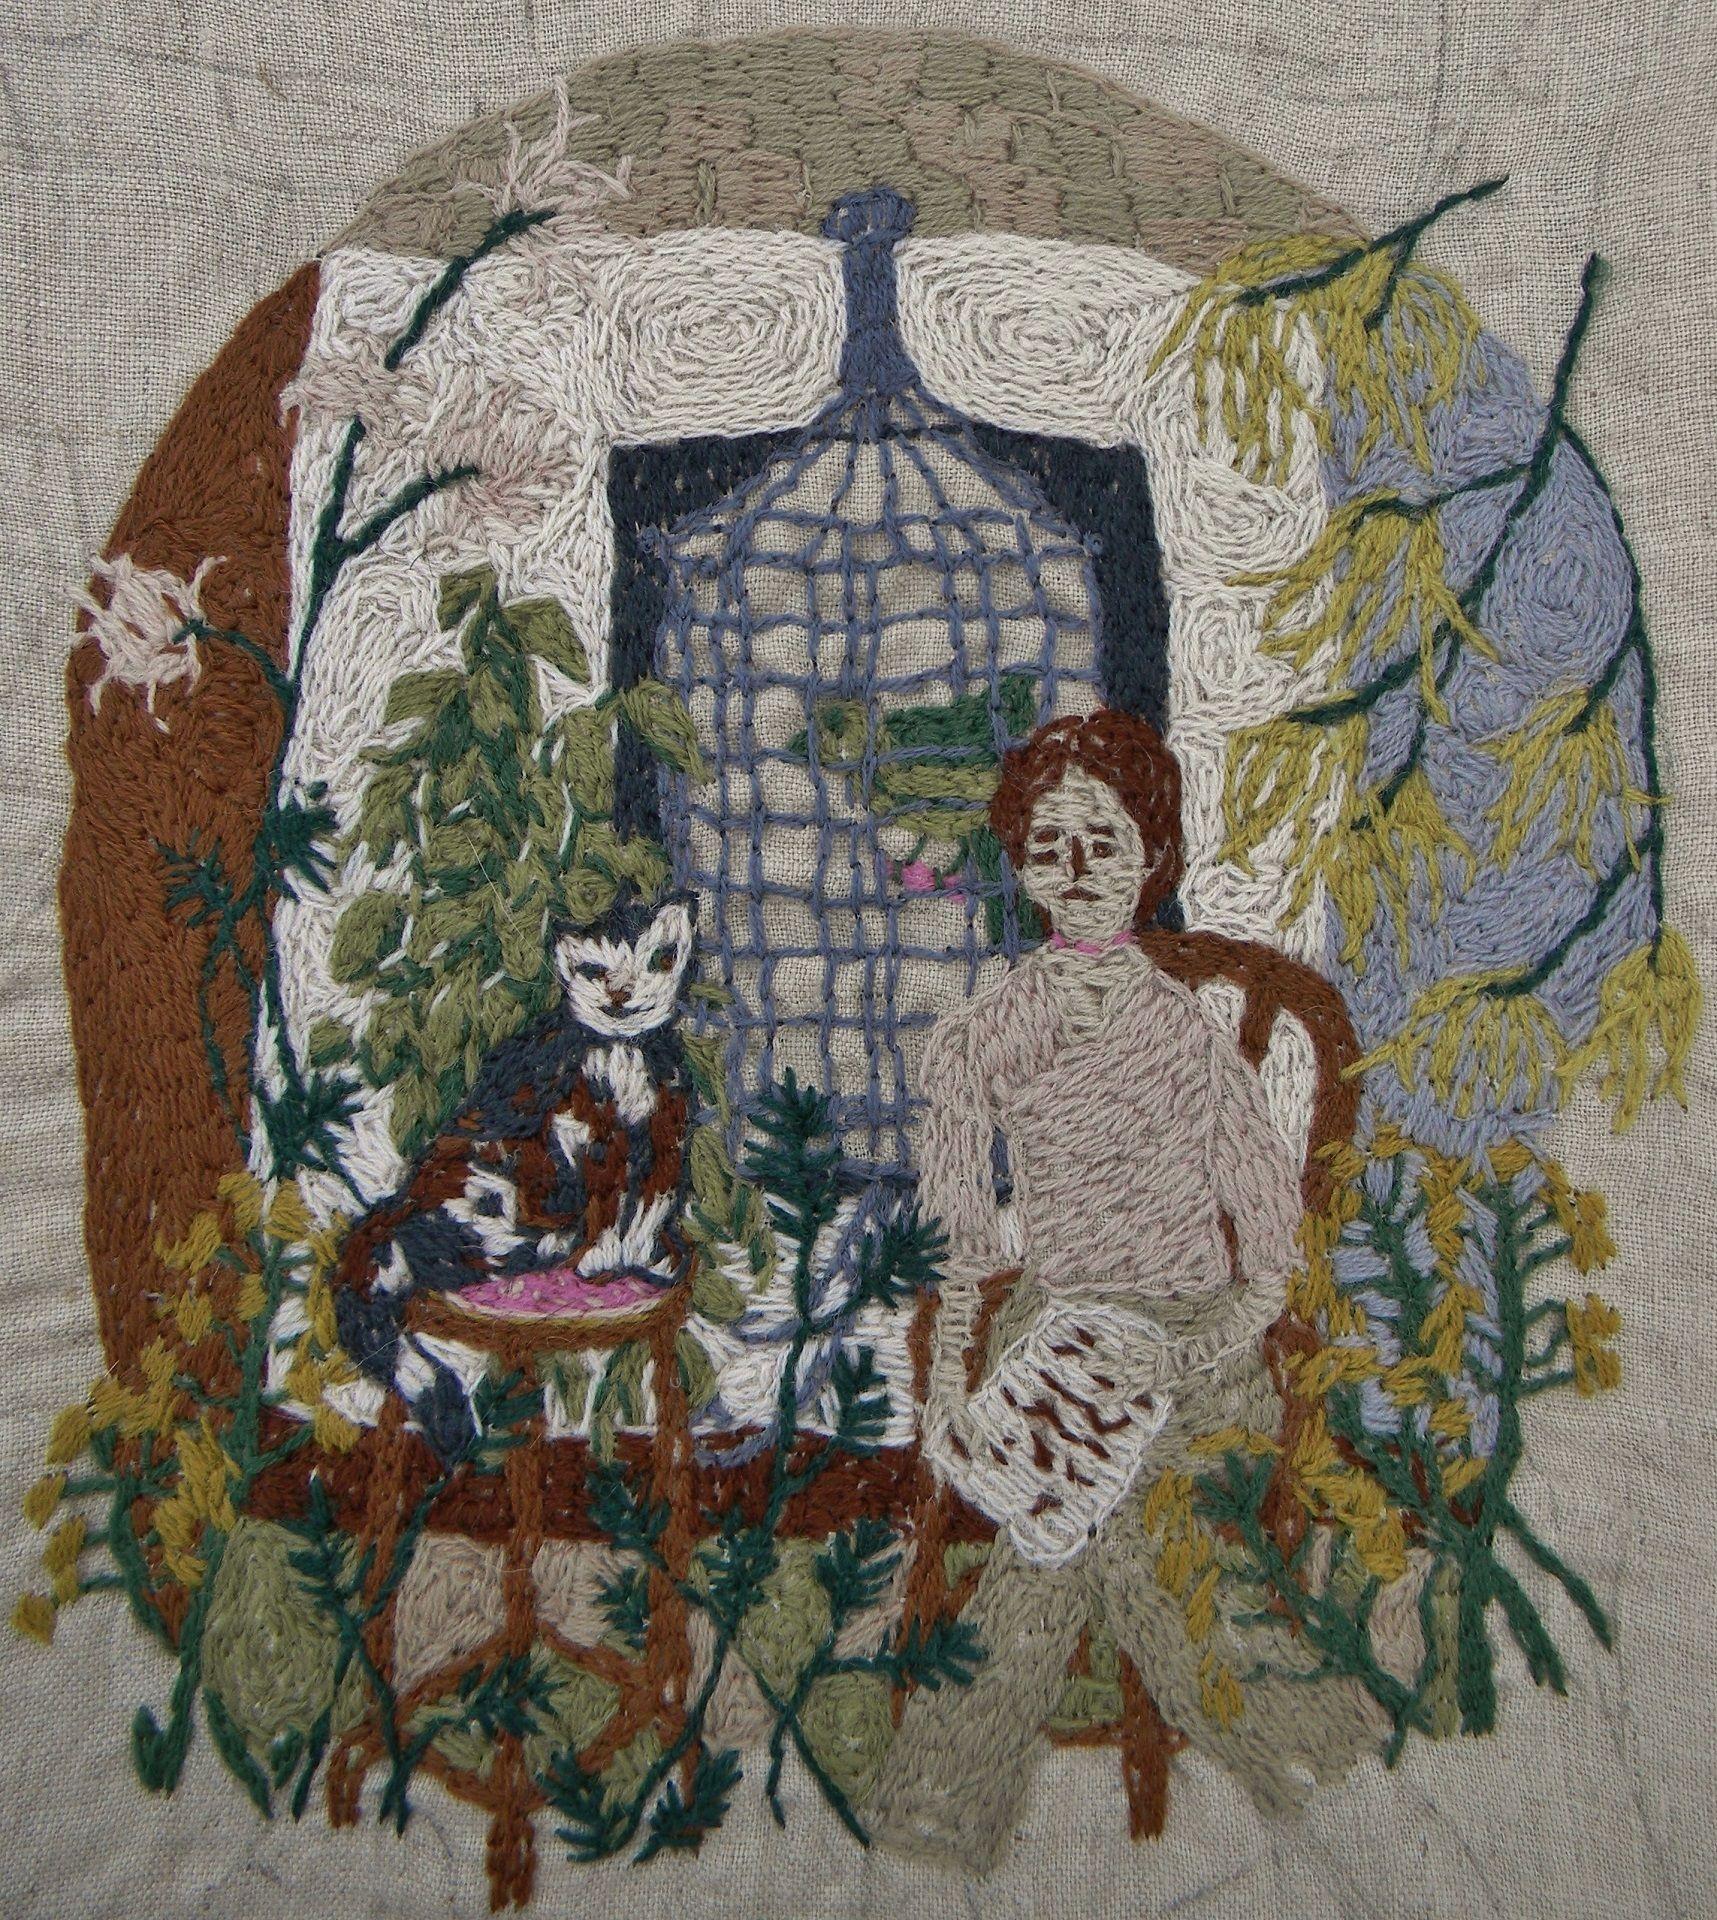 michelle kingdom embroidery artist los angeles california stitch pinterest. Black Bedroom Furniture Sets. Home Design Ideas